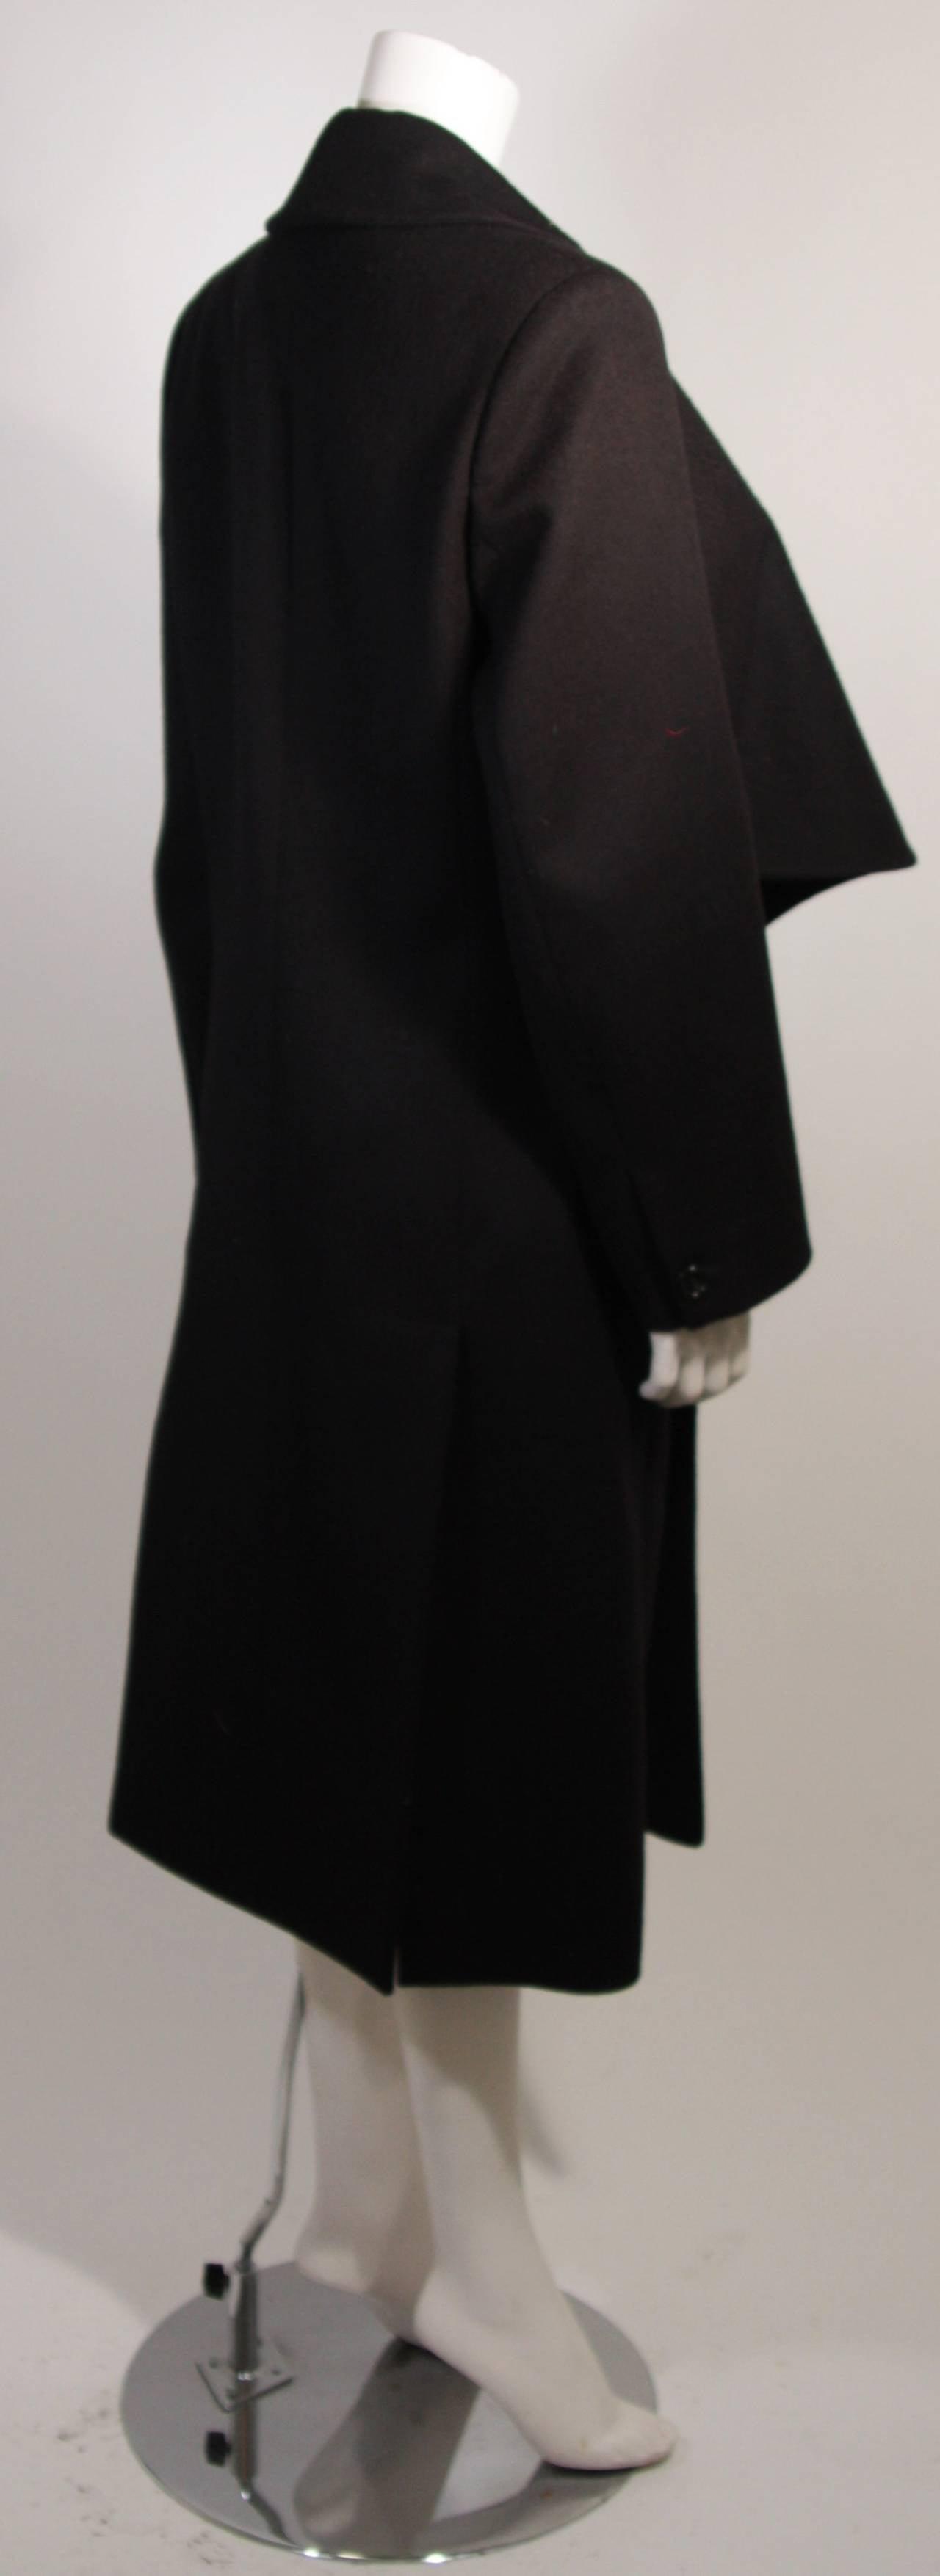 John Galliano Over-Sized Asymmetrical Collar Coat Size 10 42 For Sale 3